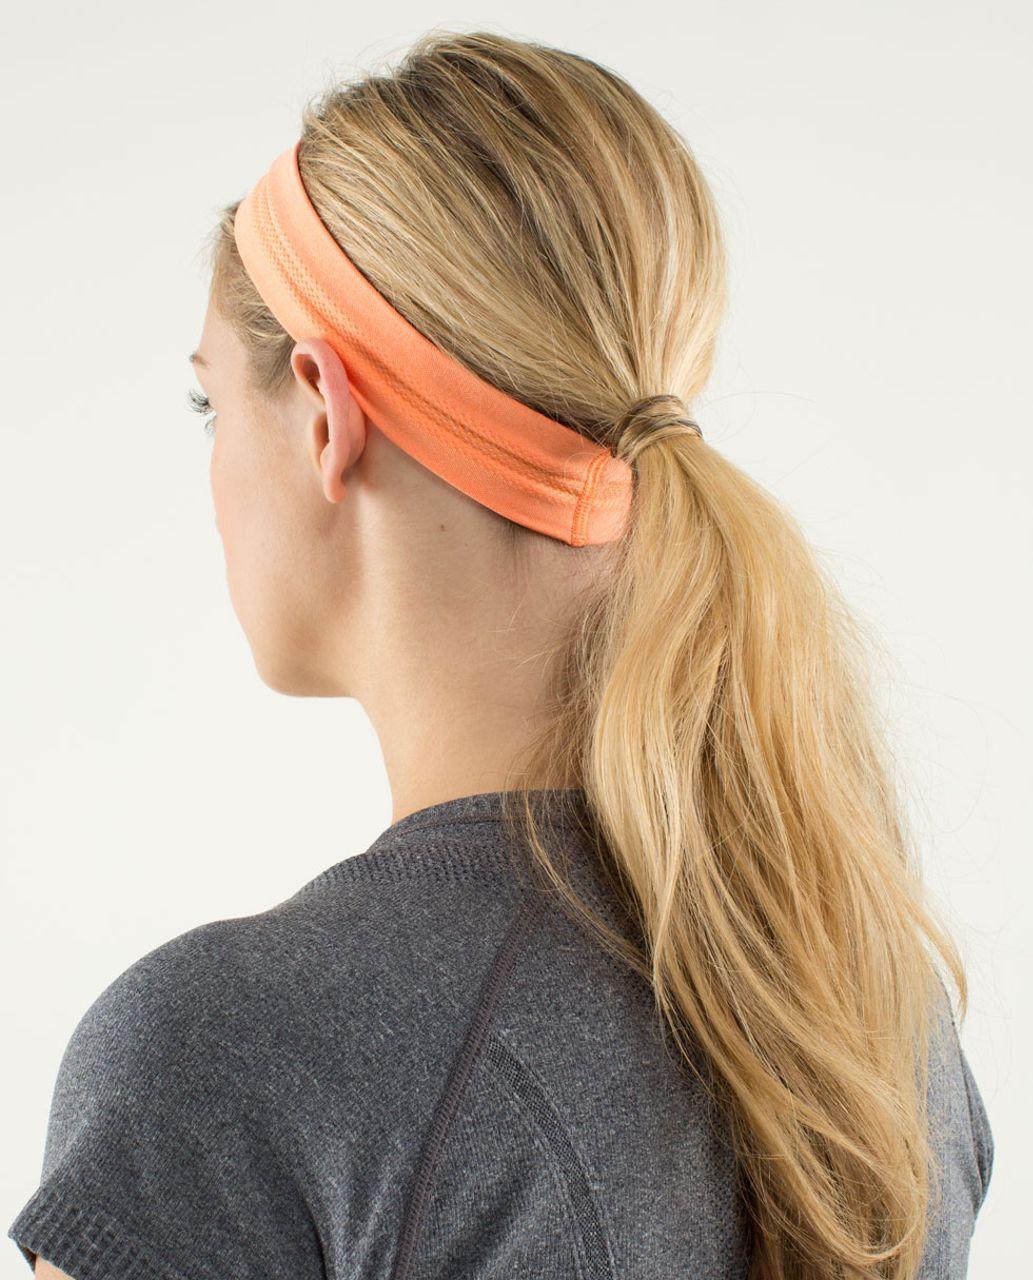 Lululemon Swiftly Headband - Pizzaz